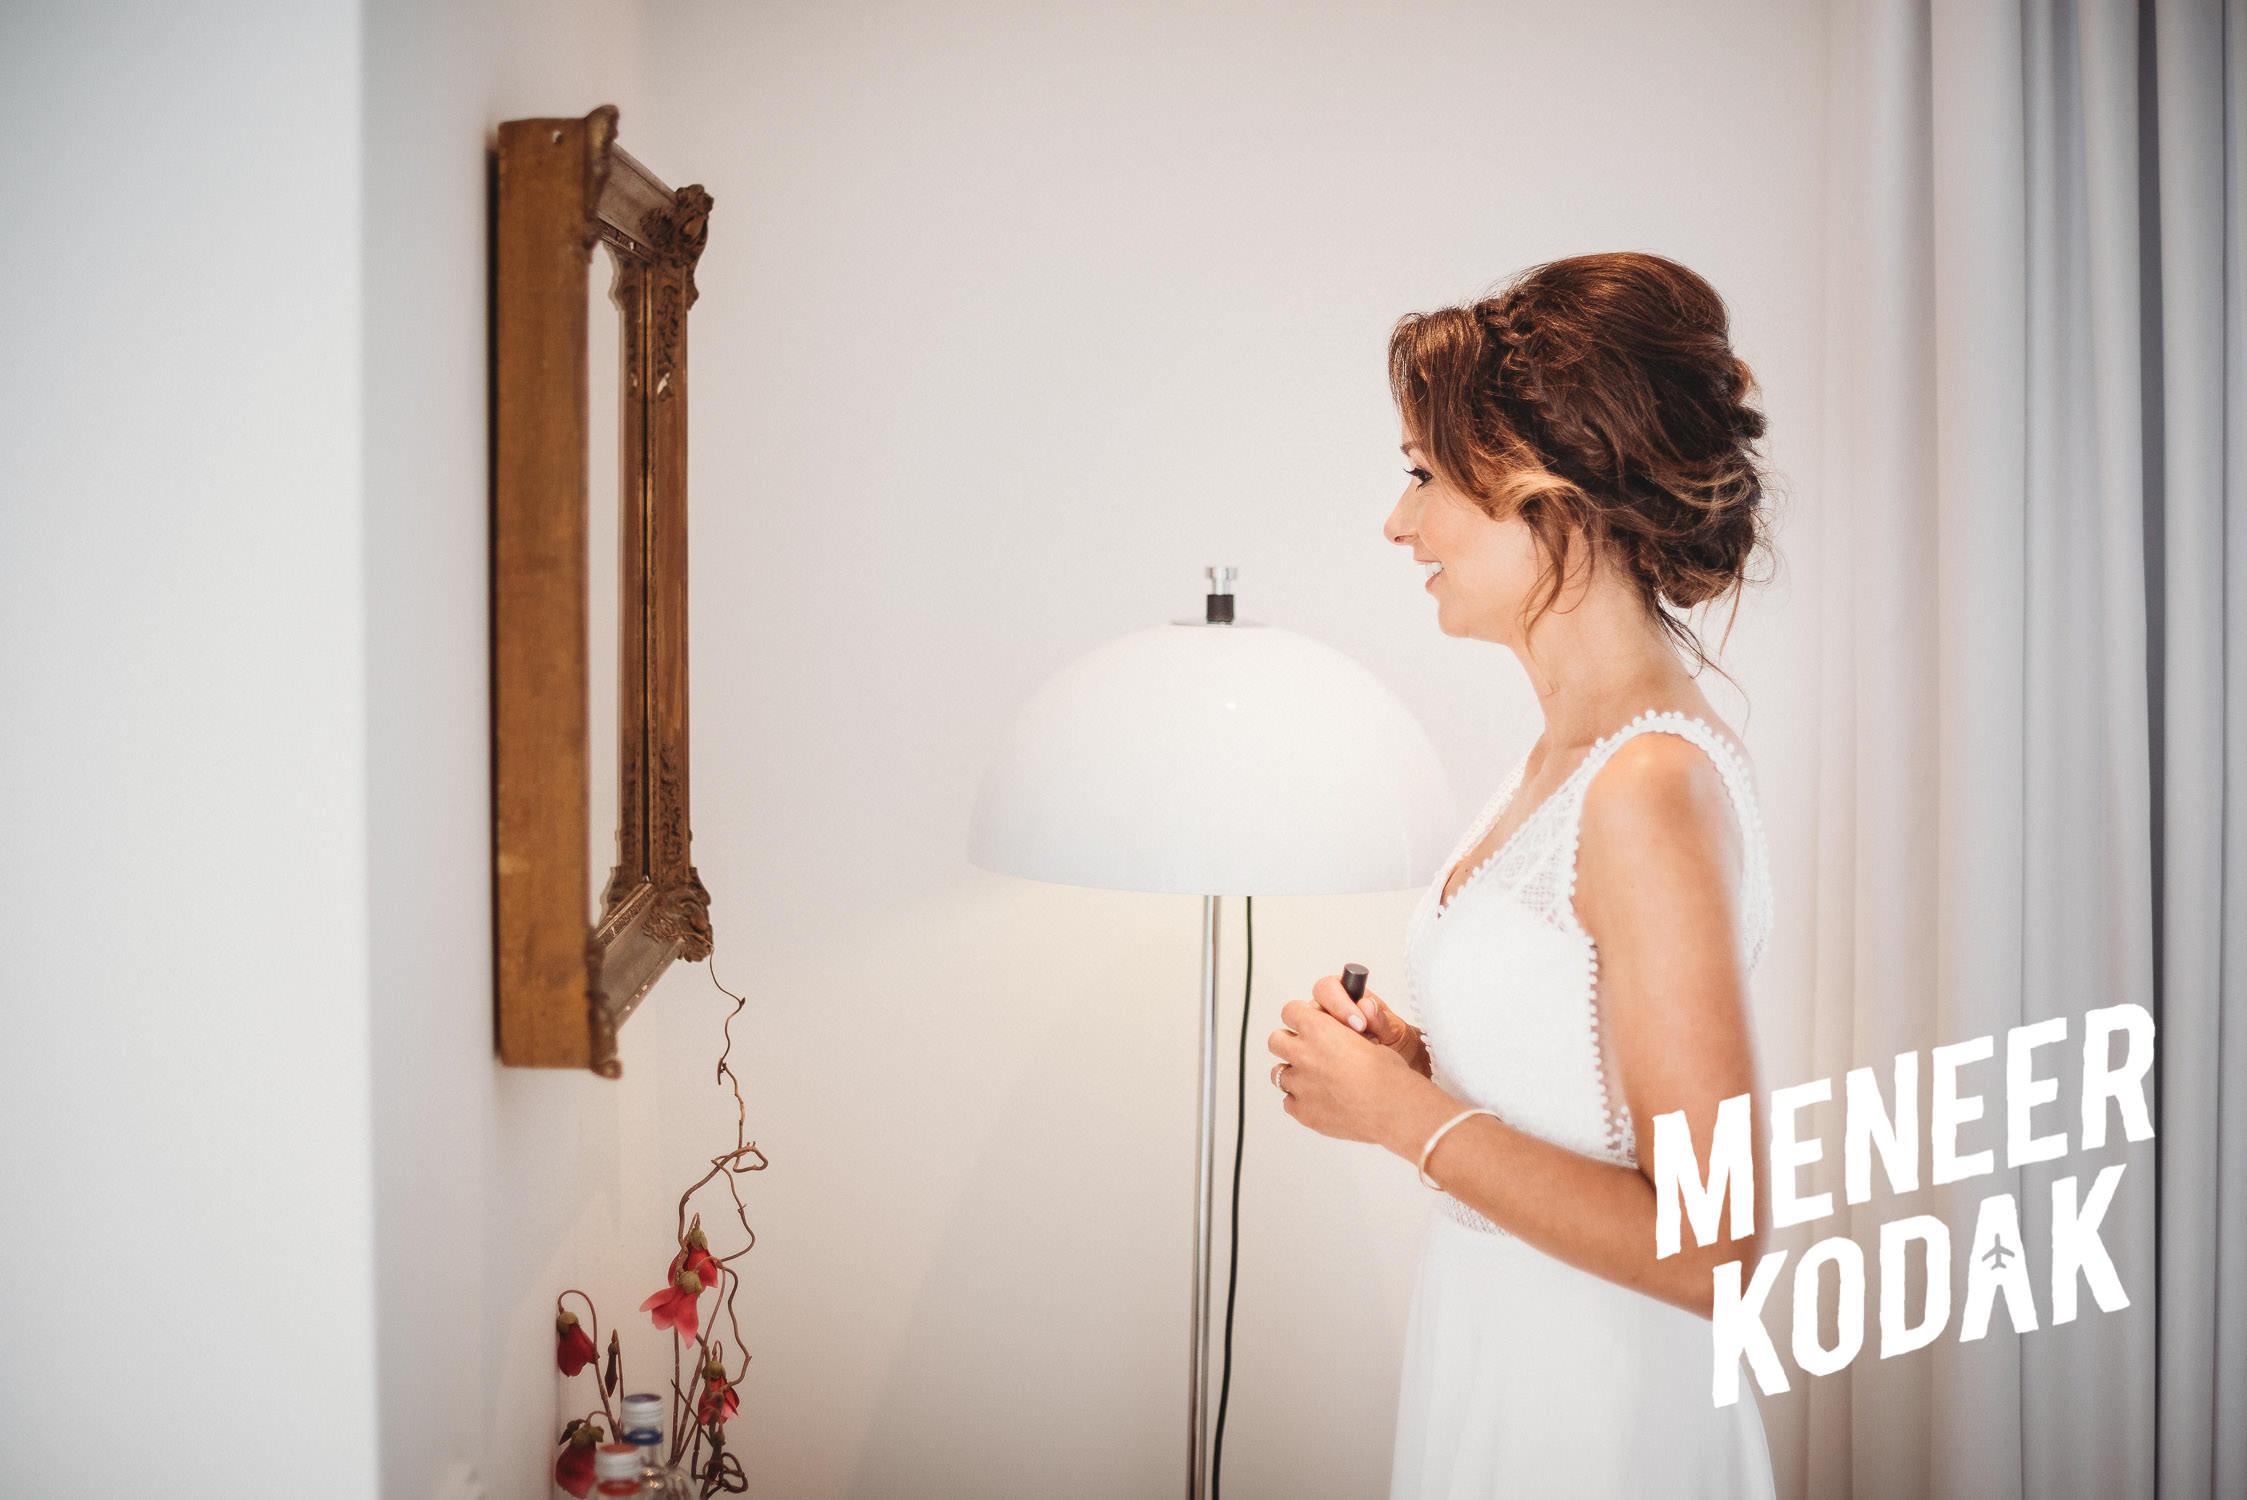 Meneer Kodak - Strandbruiloft - Noordwijk - K&A-071.jpg